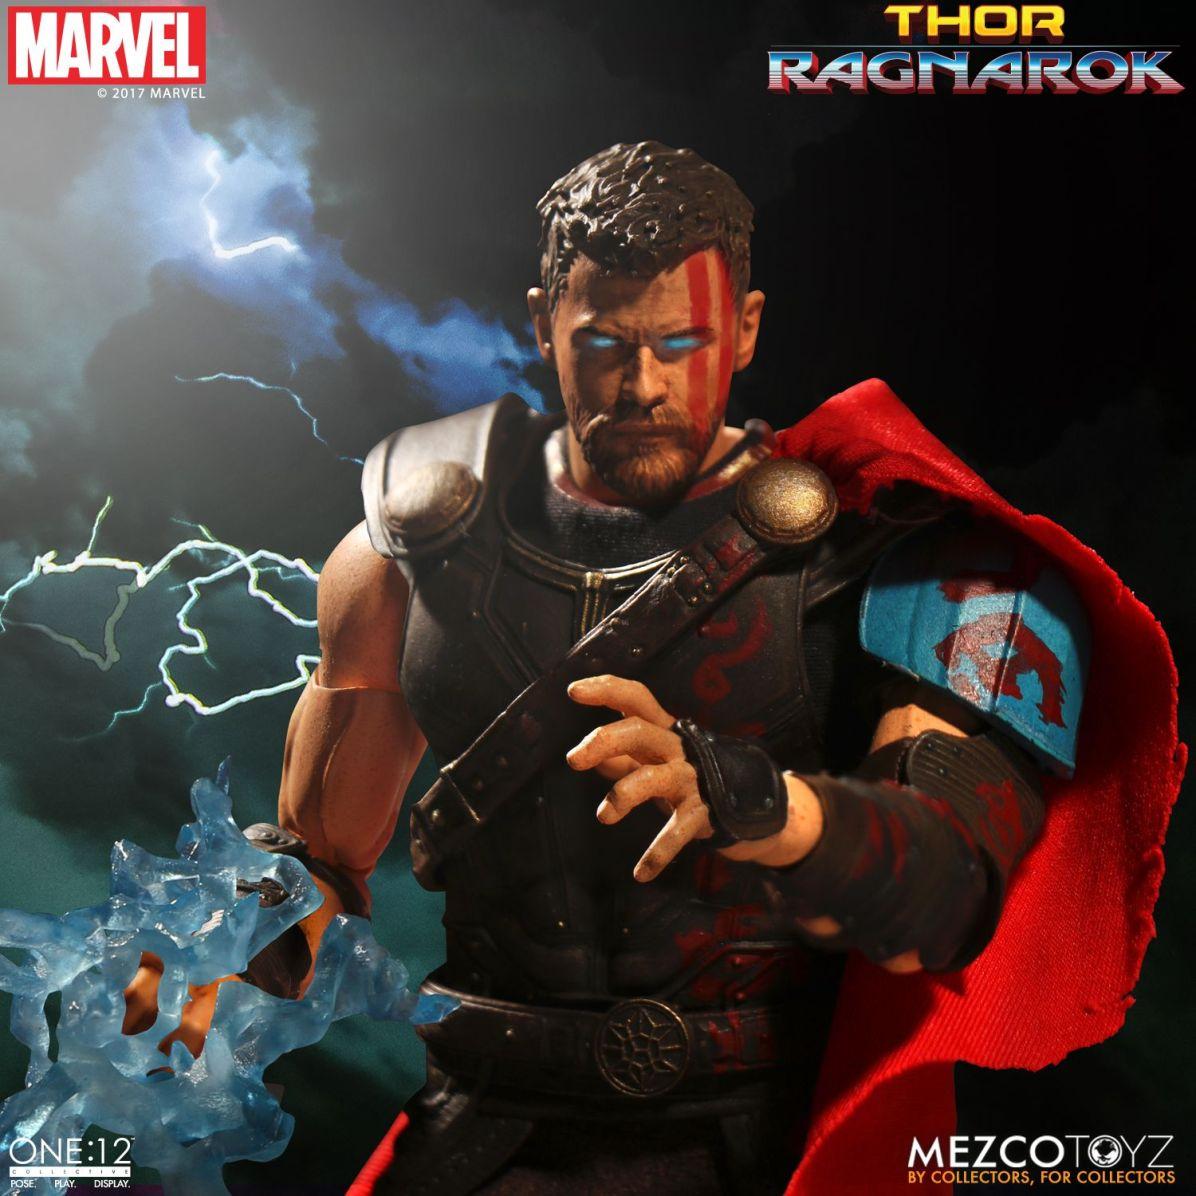 Mezco: One:12 Ragnarok Thor Available for Preorder